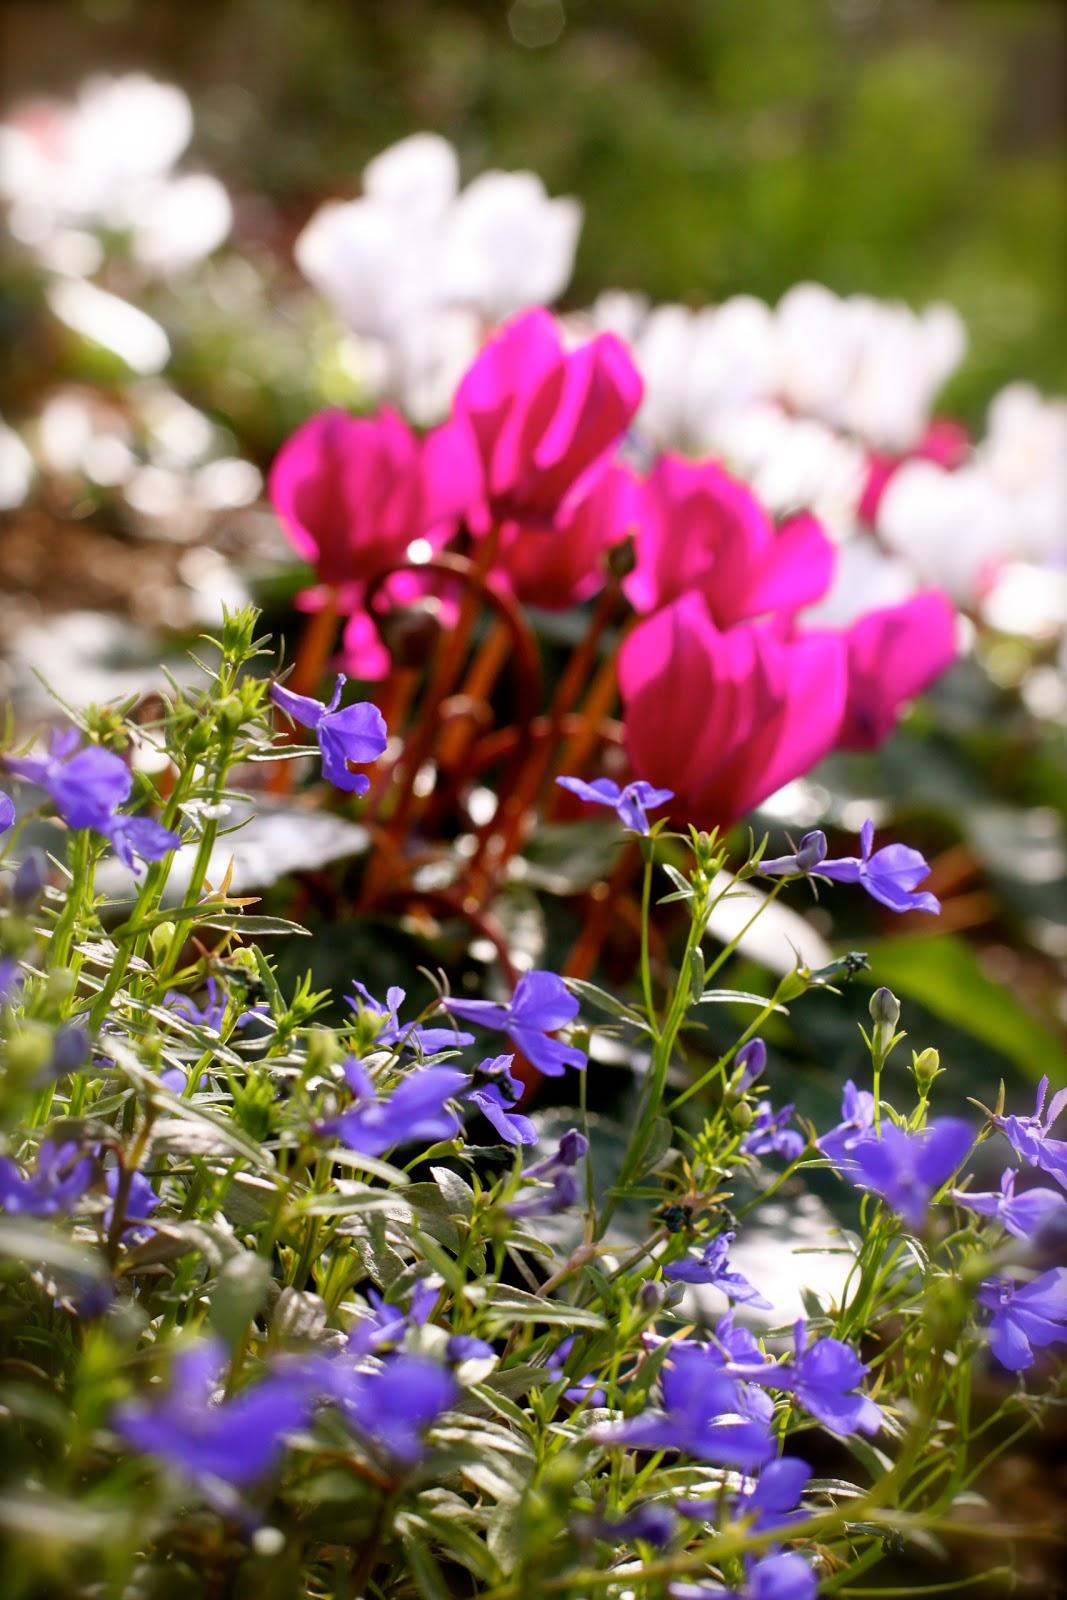 rambling wren cyclamen add bright color to a winter garden